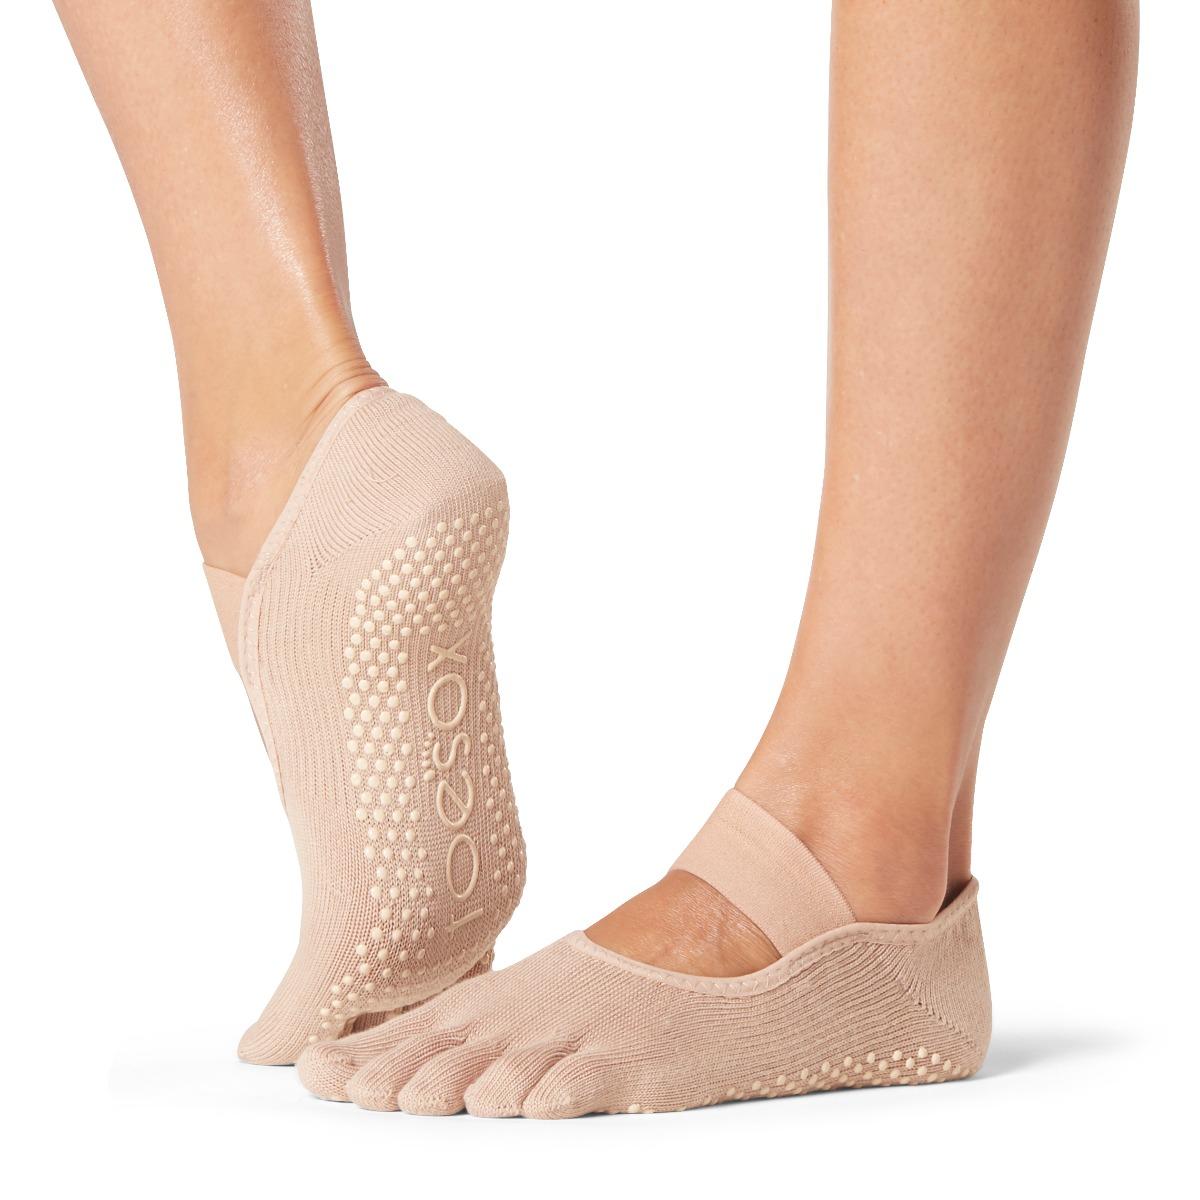 Yogasocken ToeSox Mia Full Toe Nude